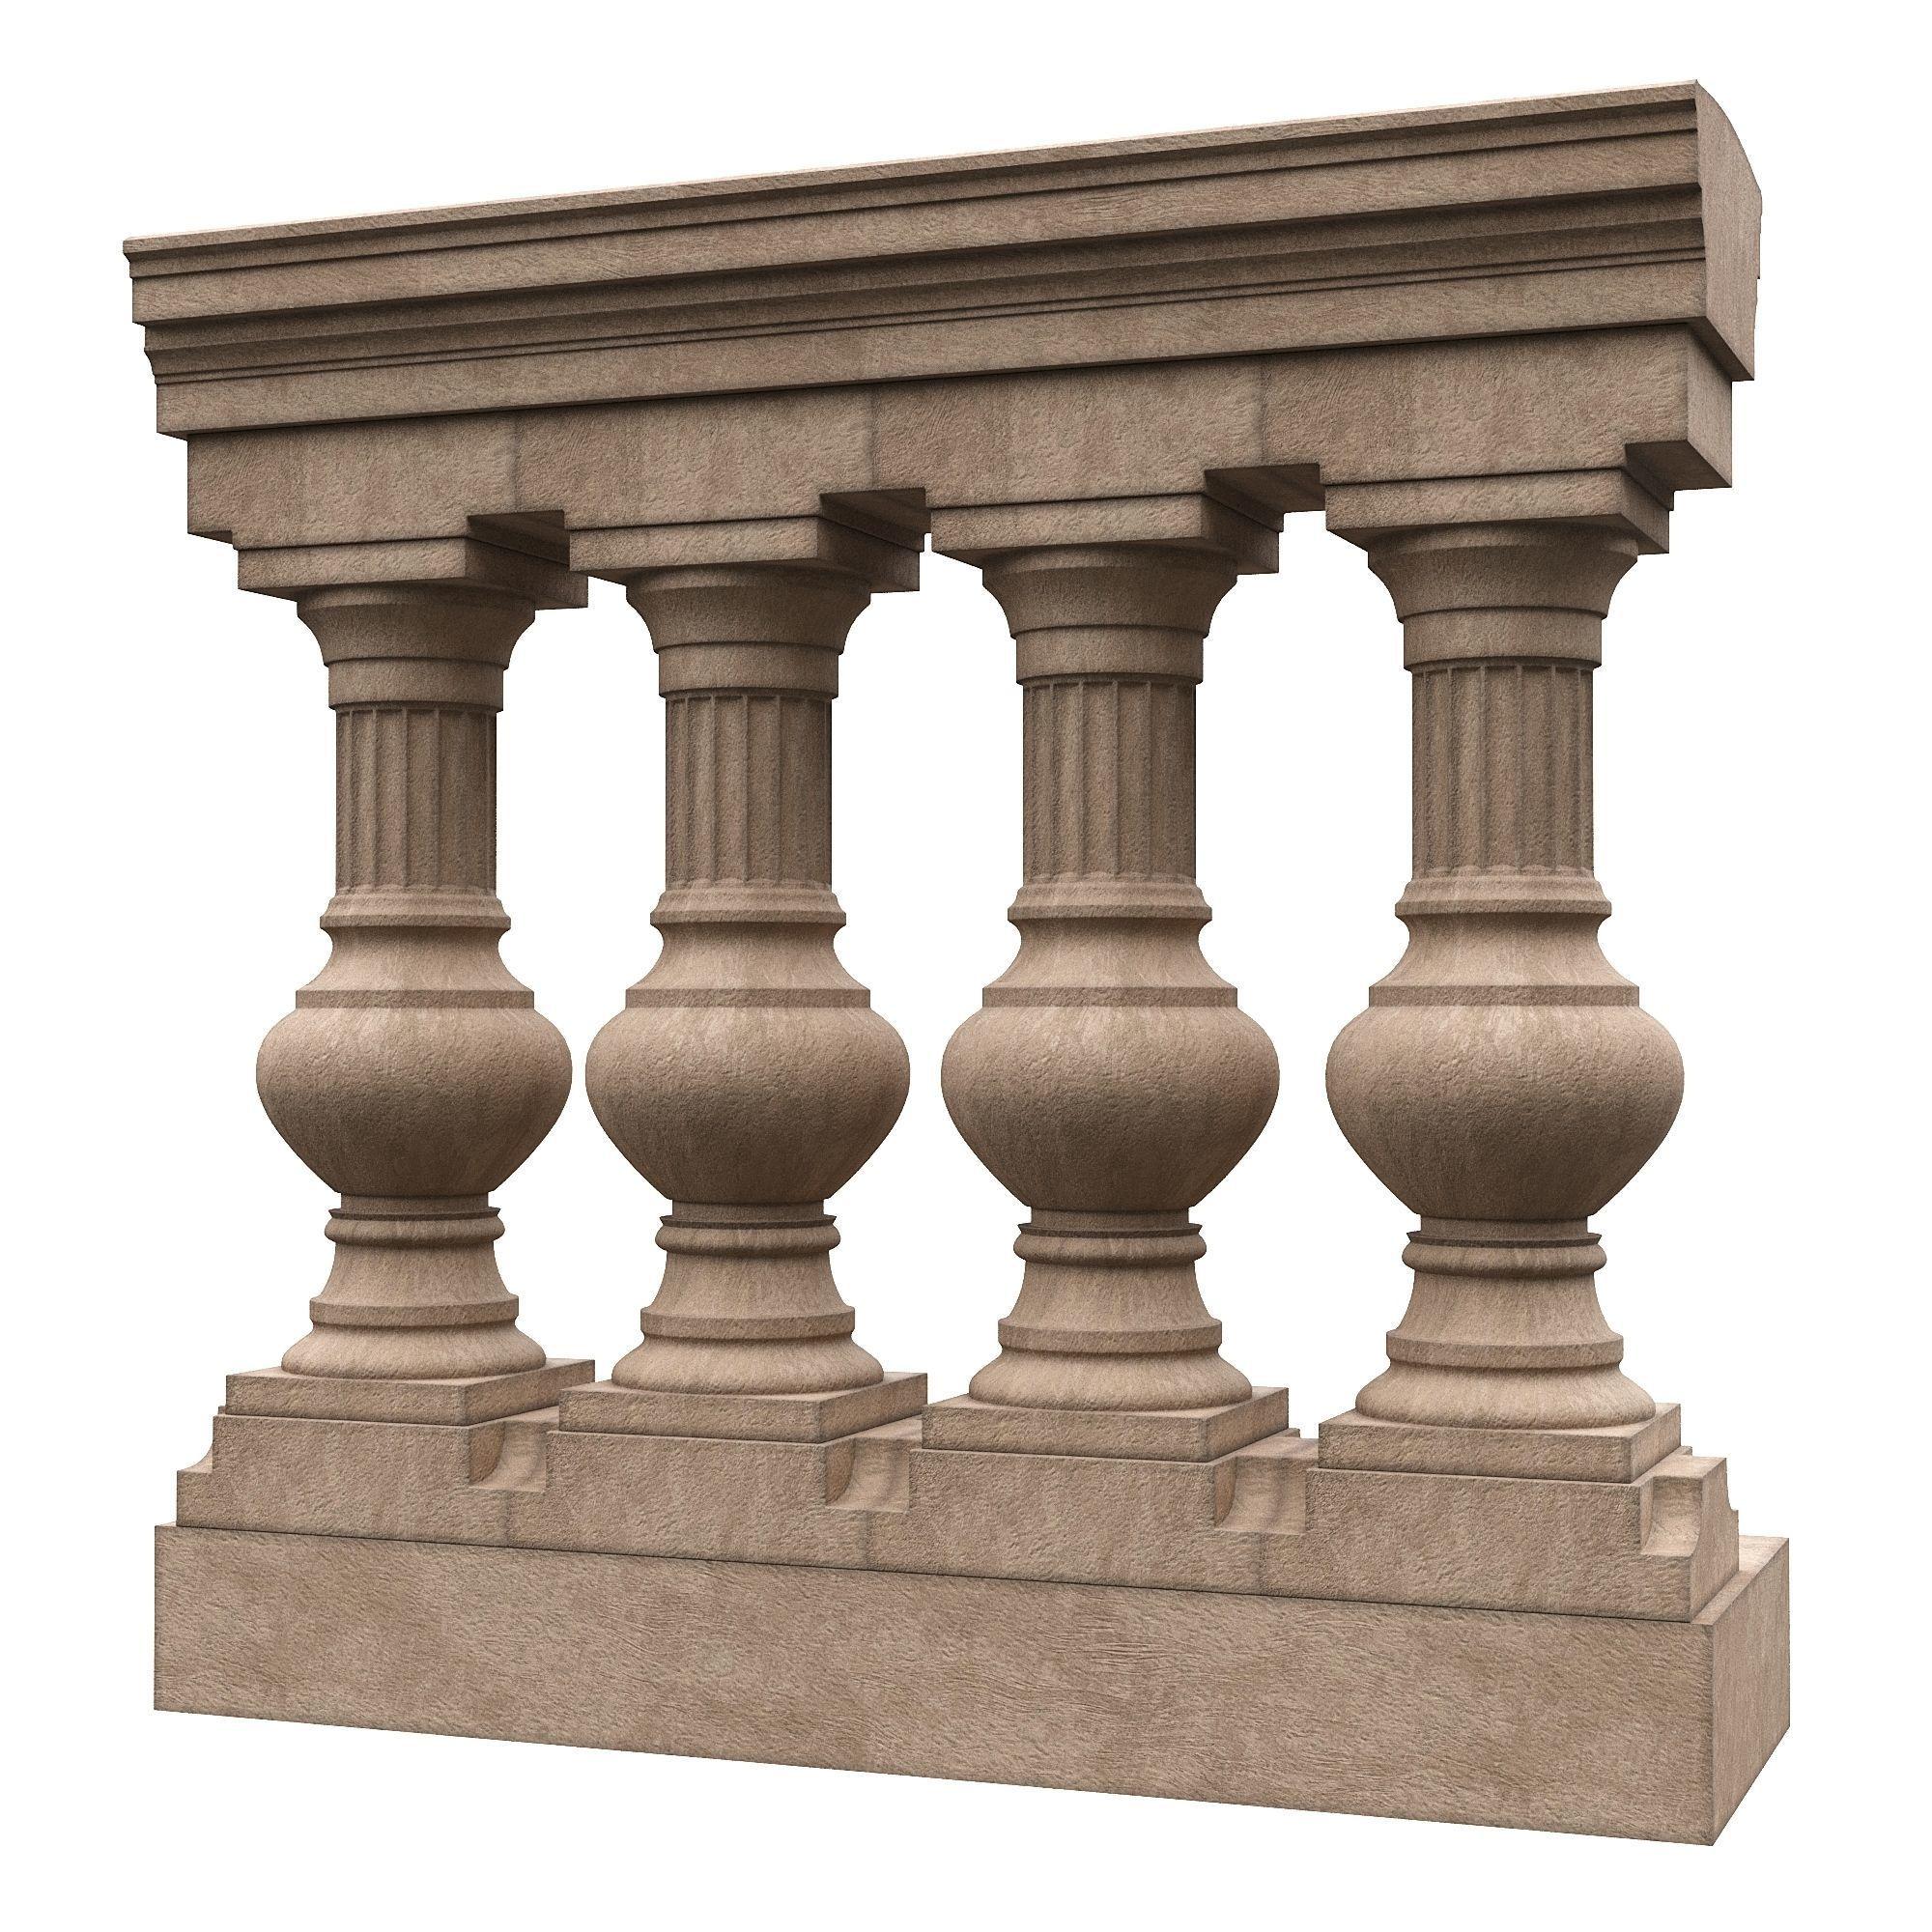 Stone balustrade 09